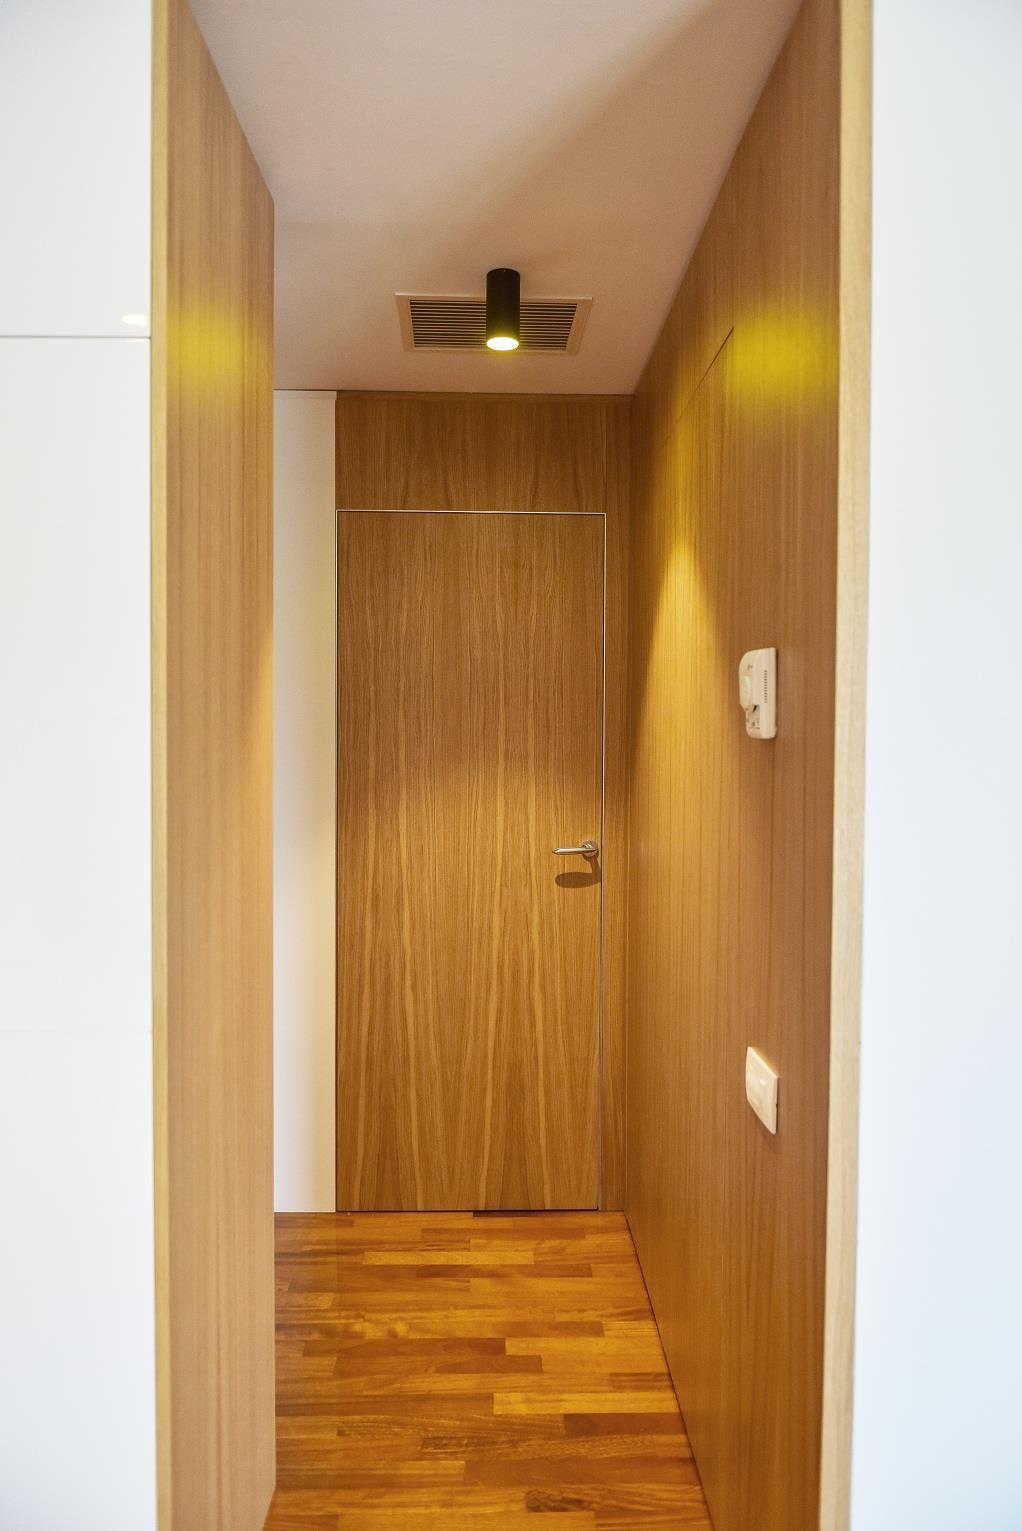 Design_Scandinav_usi_albe_White_Design_usa_filomuro